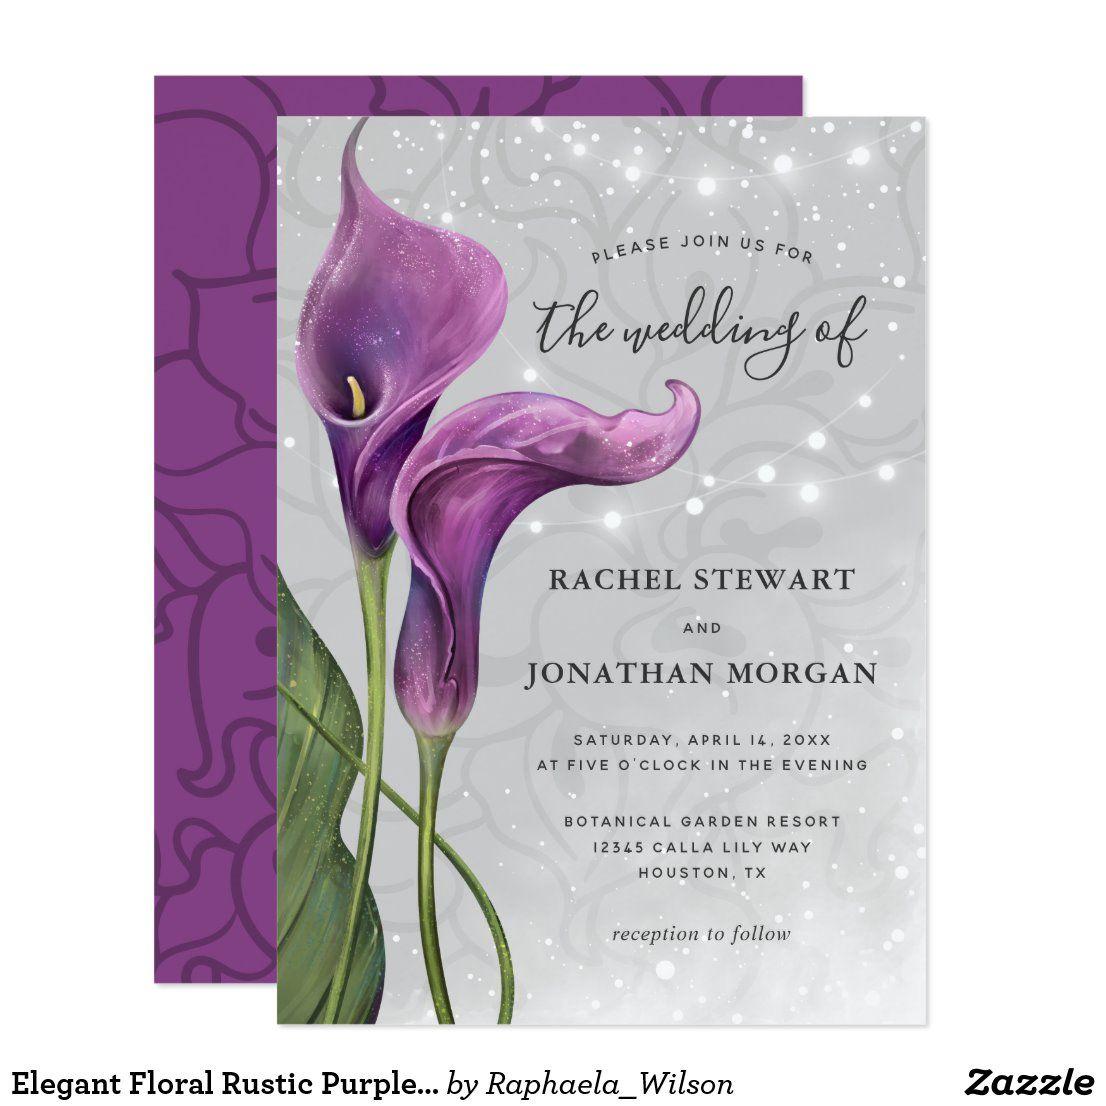 Elegant Floral Rustic Purple Calla Lily Wedding Invitation